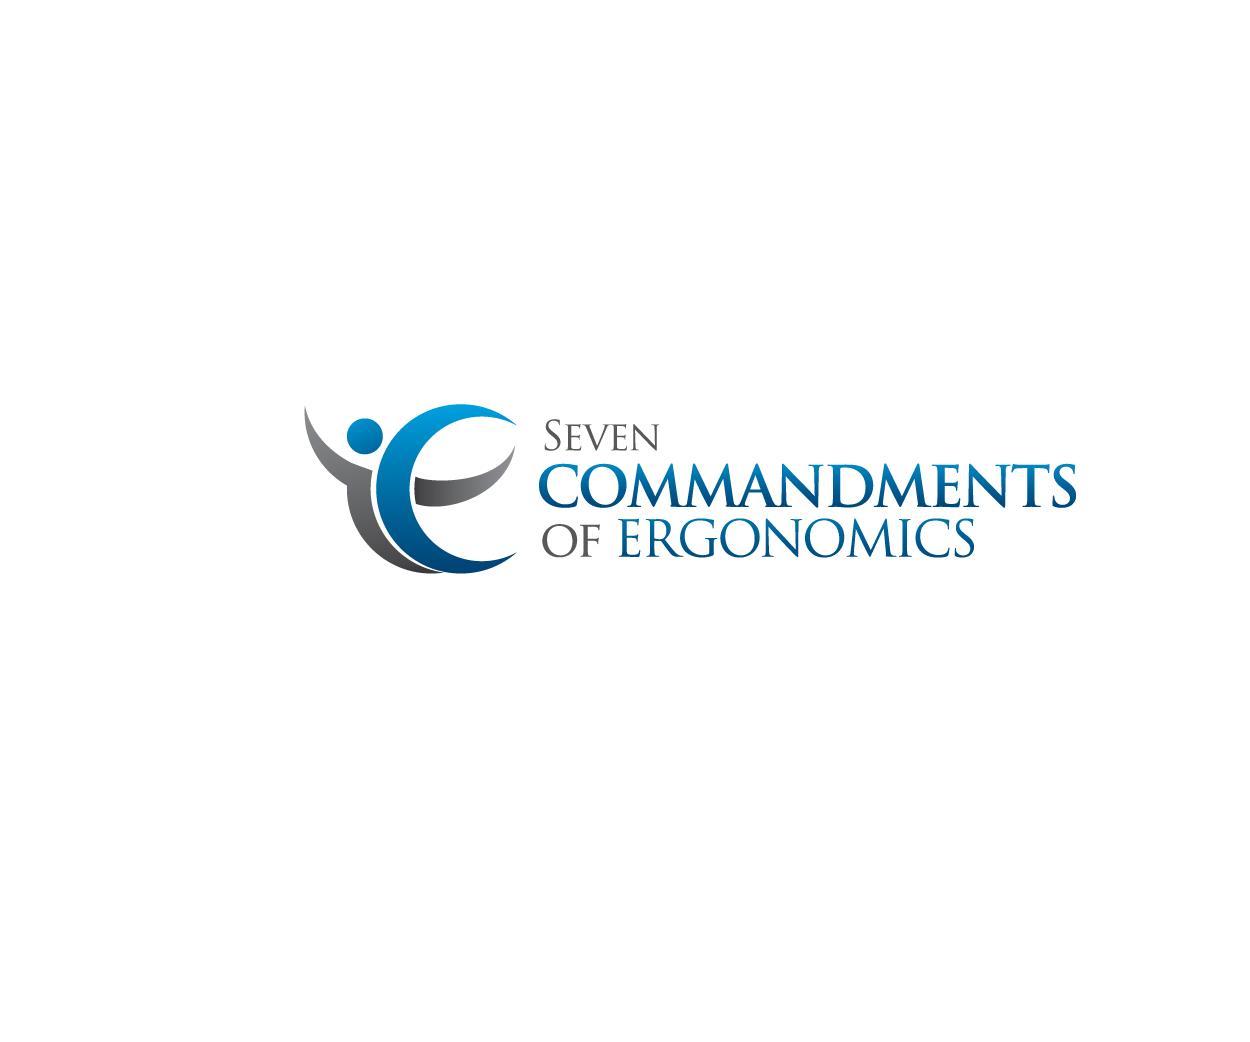 Logo Design by Private User - Entry No. 84 in the Logo Design Contest Logo Design for Seven Commandments of Ergonomics.